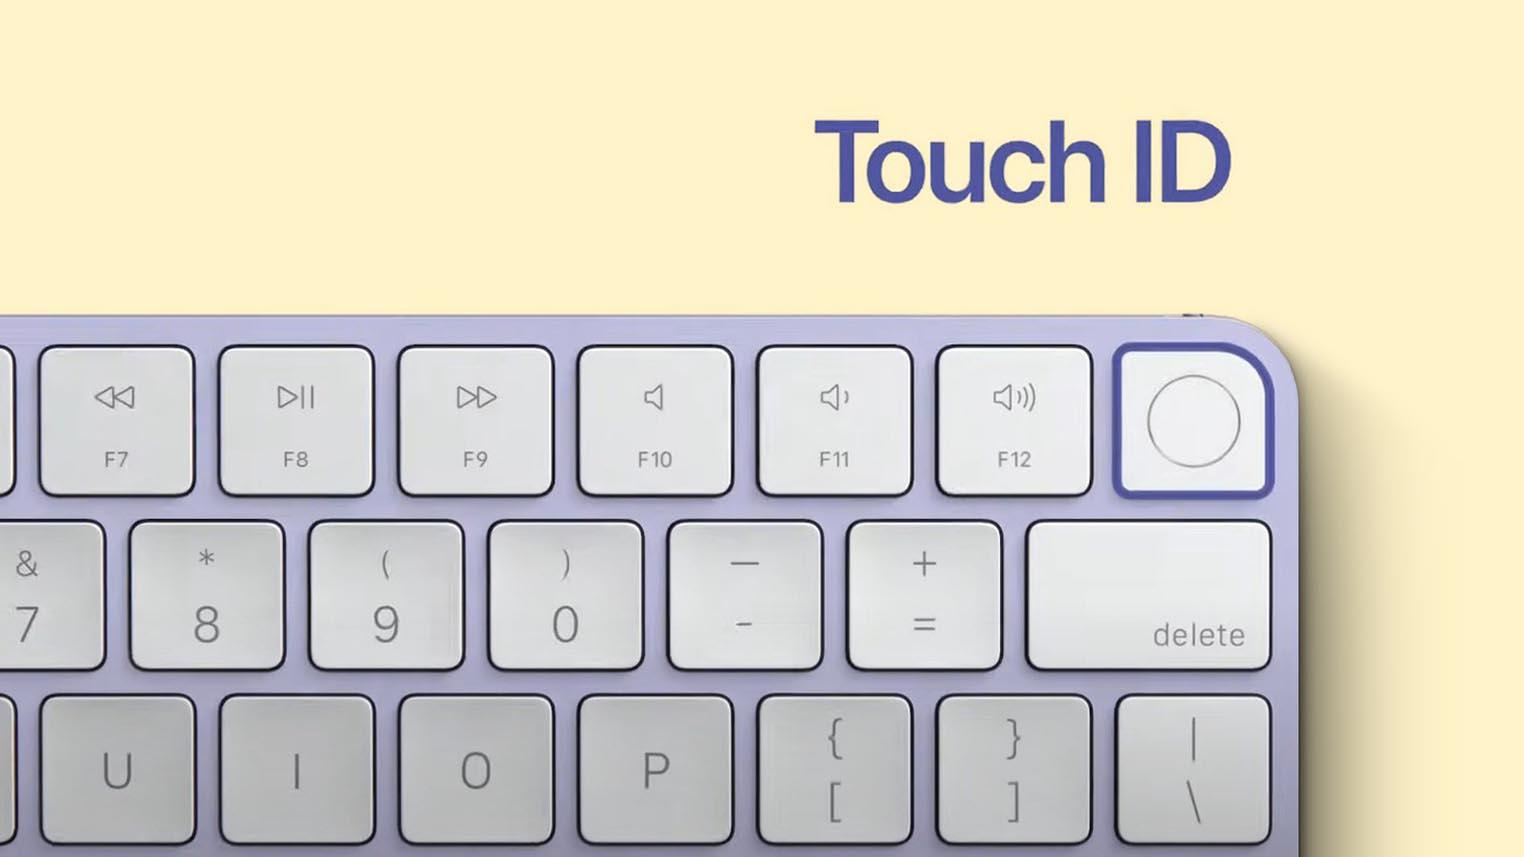 Touch ID Magic Keyboard